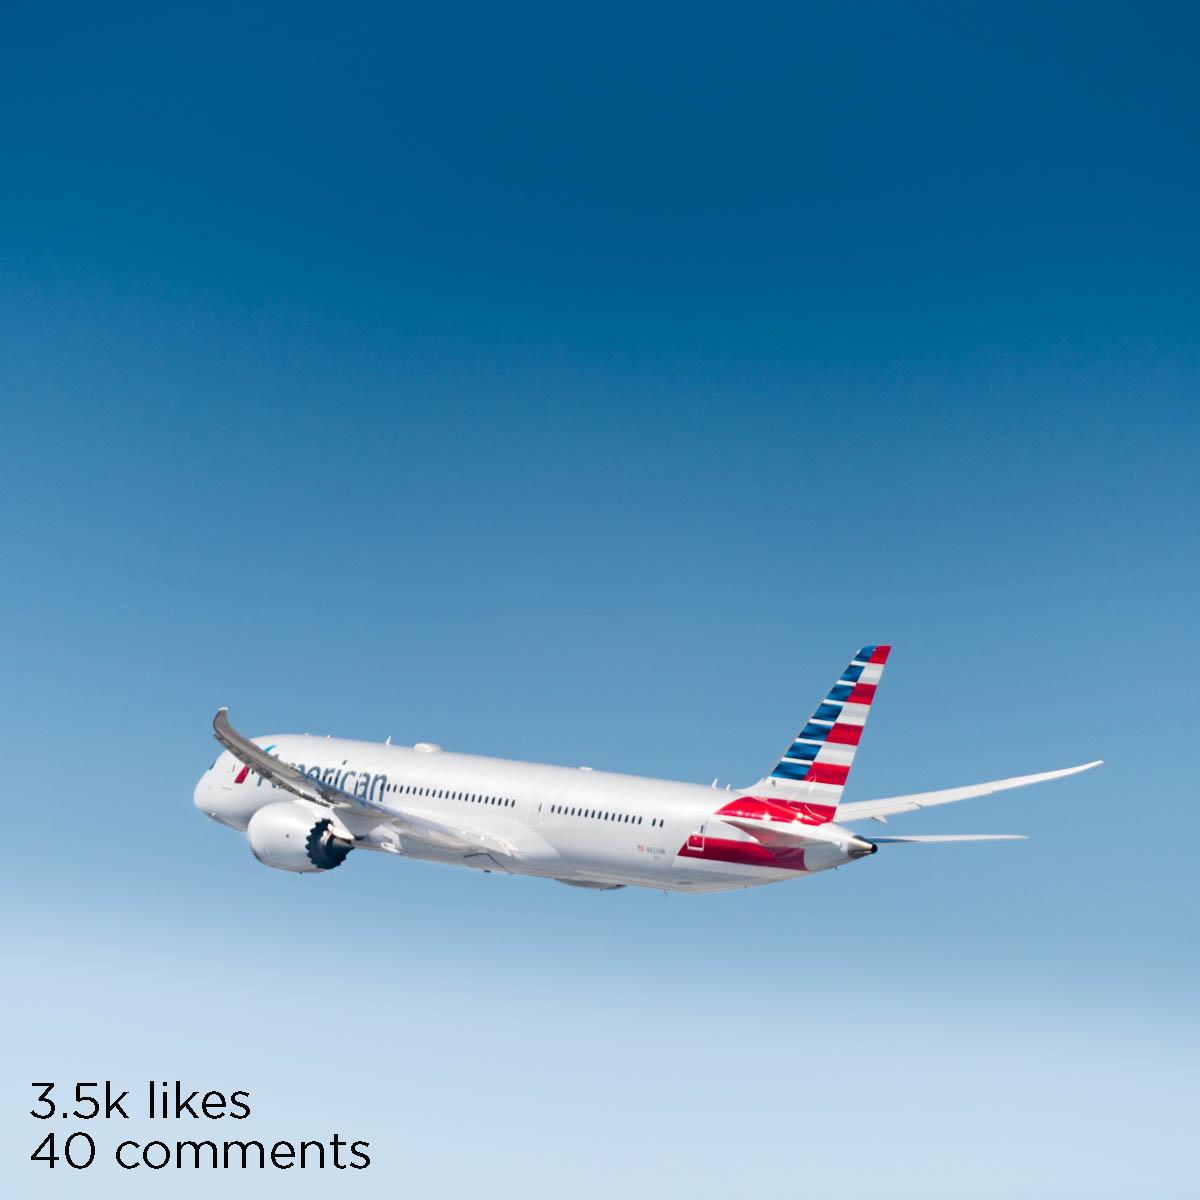 aa 787 take off blue sky (1 of 1) copy.jpg